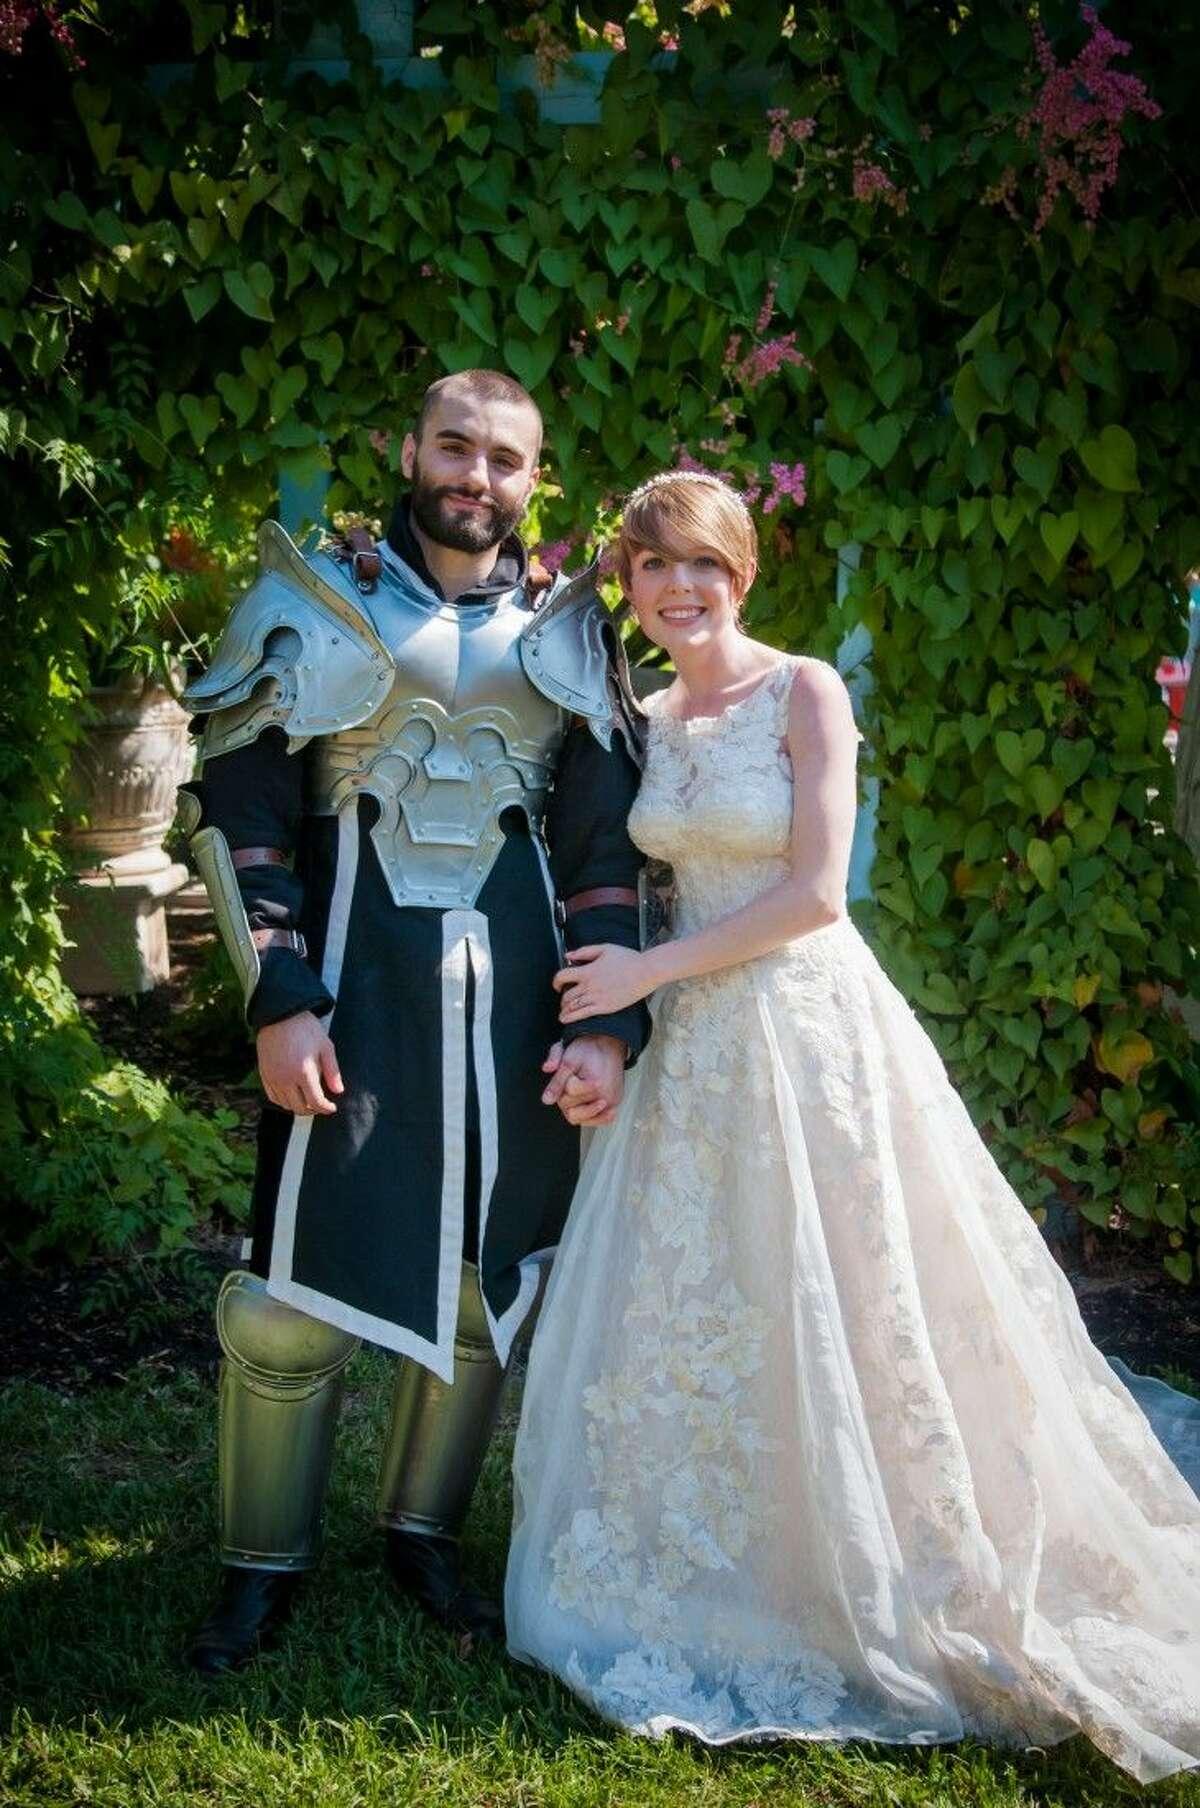 Ariel & Kaellub Carpenter celebrated their dream wedding at the Texas Renaissance Festival in 2015.